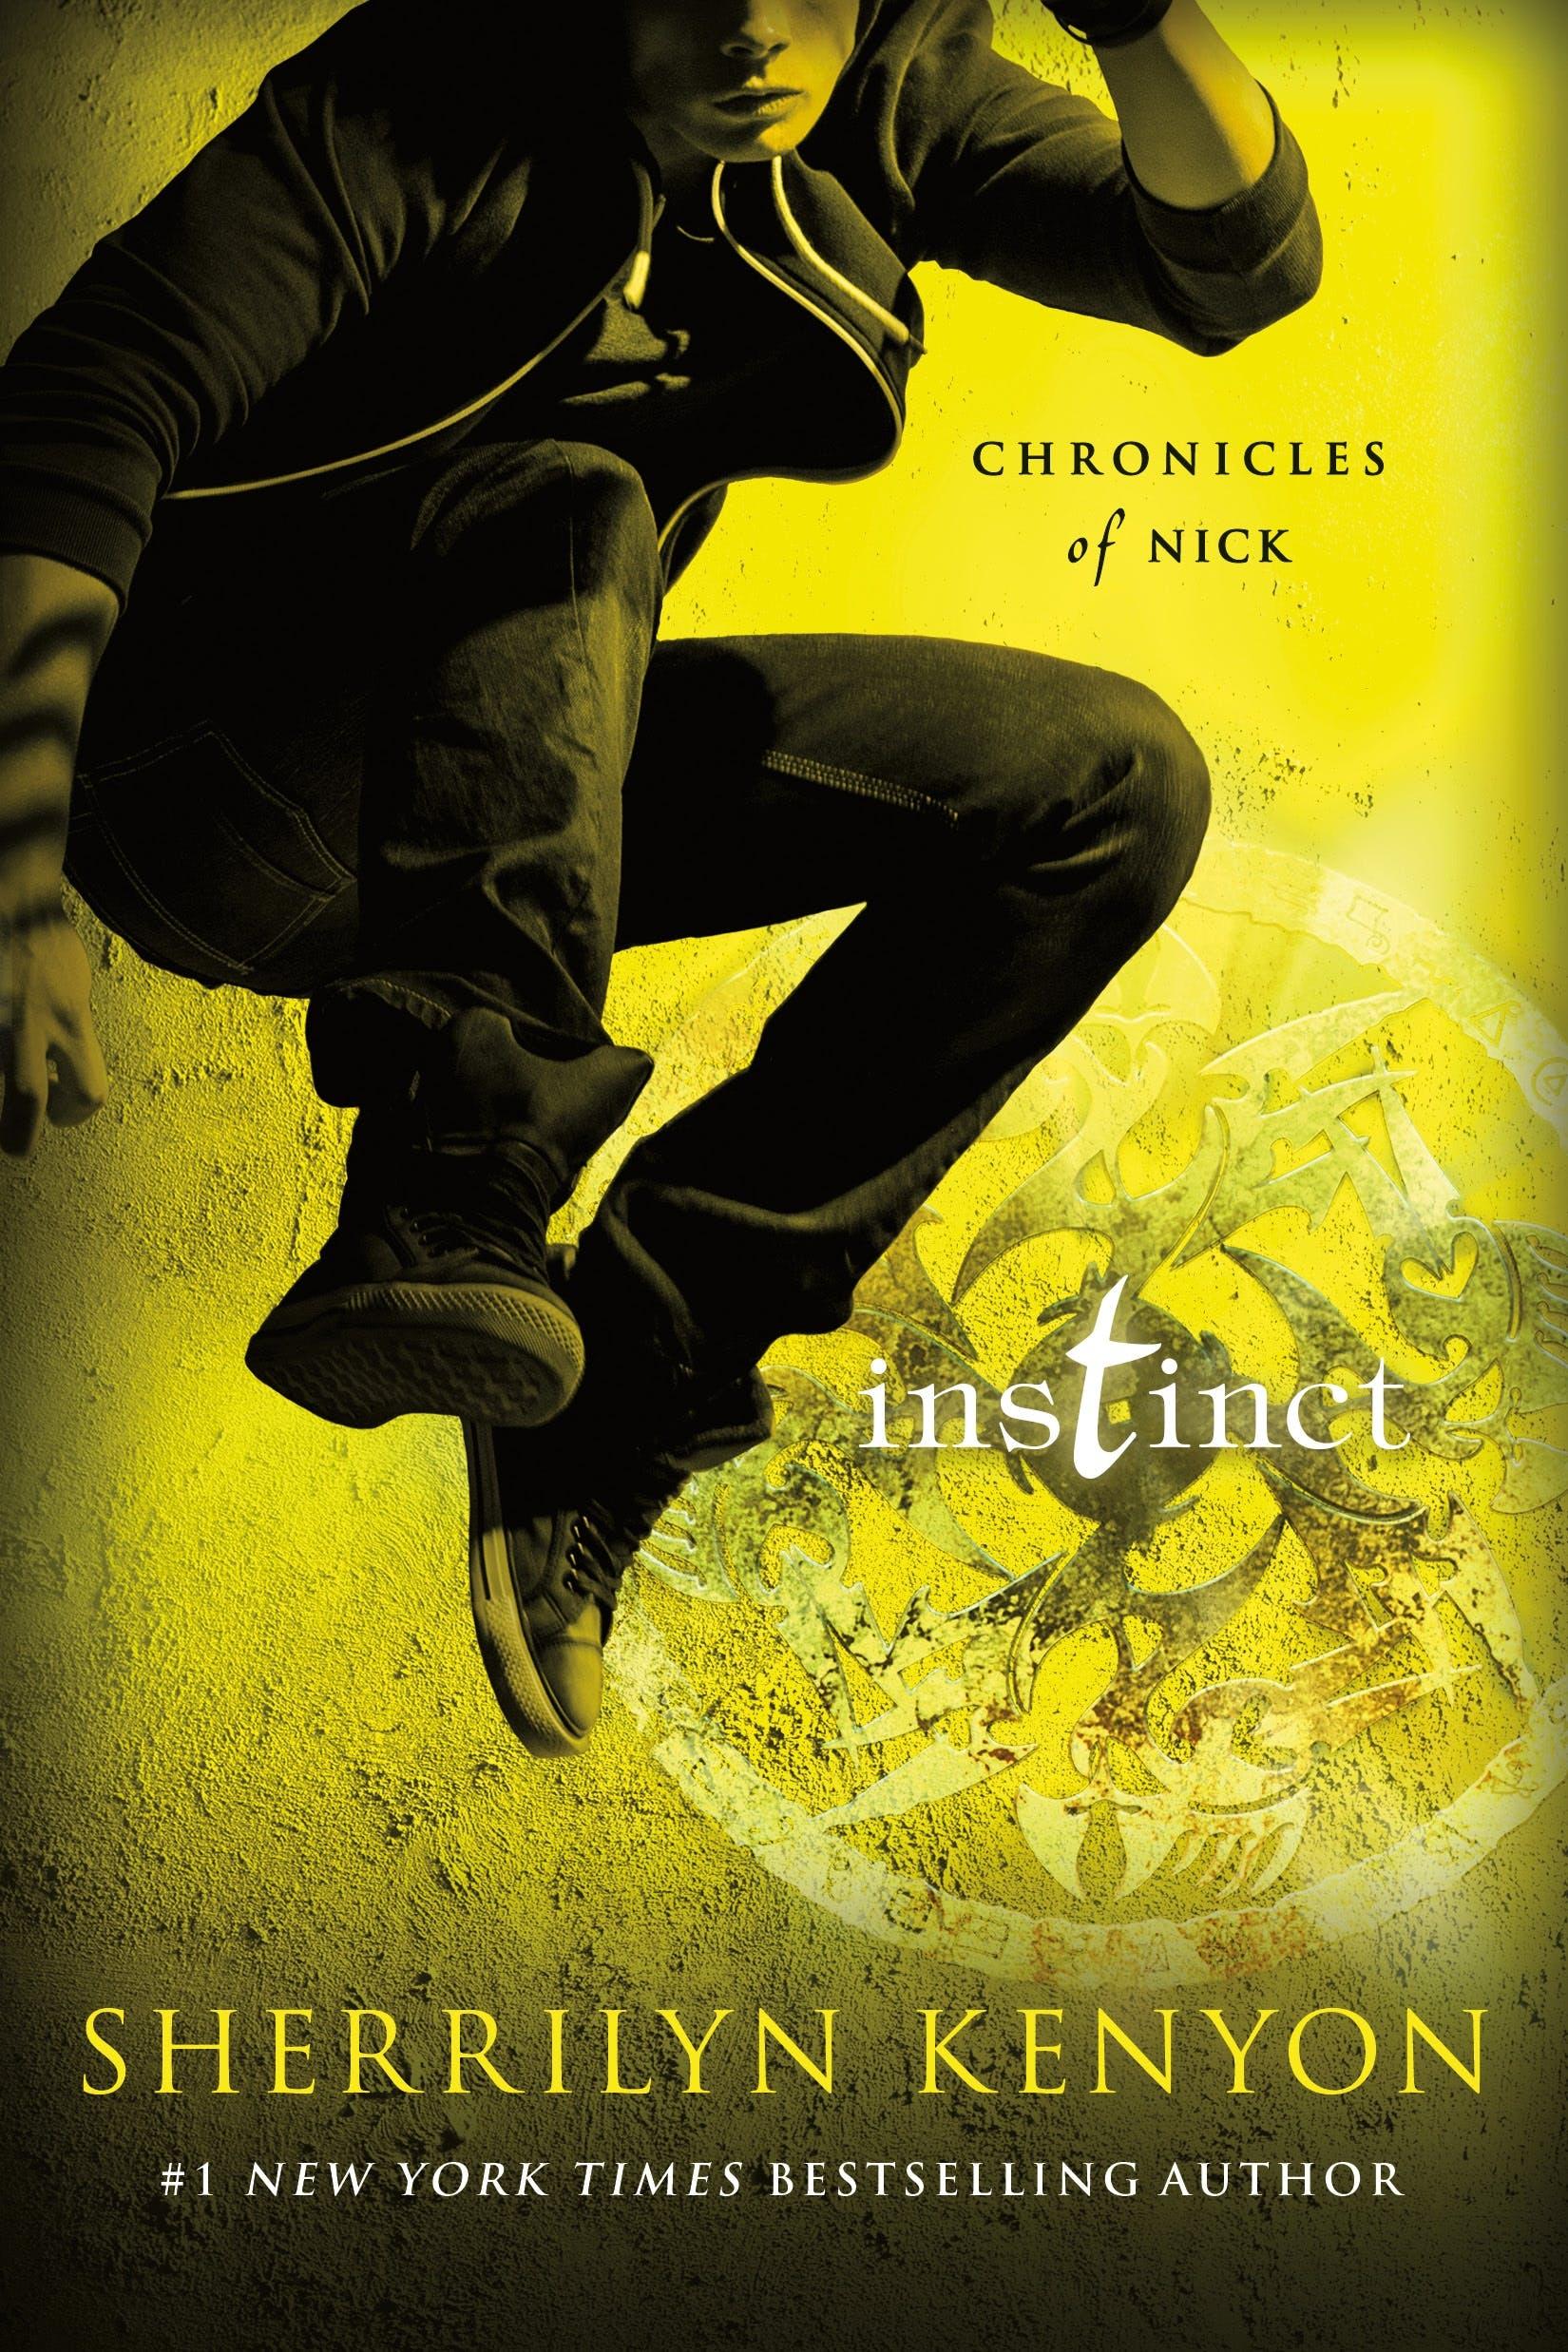 Image of Instinct